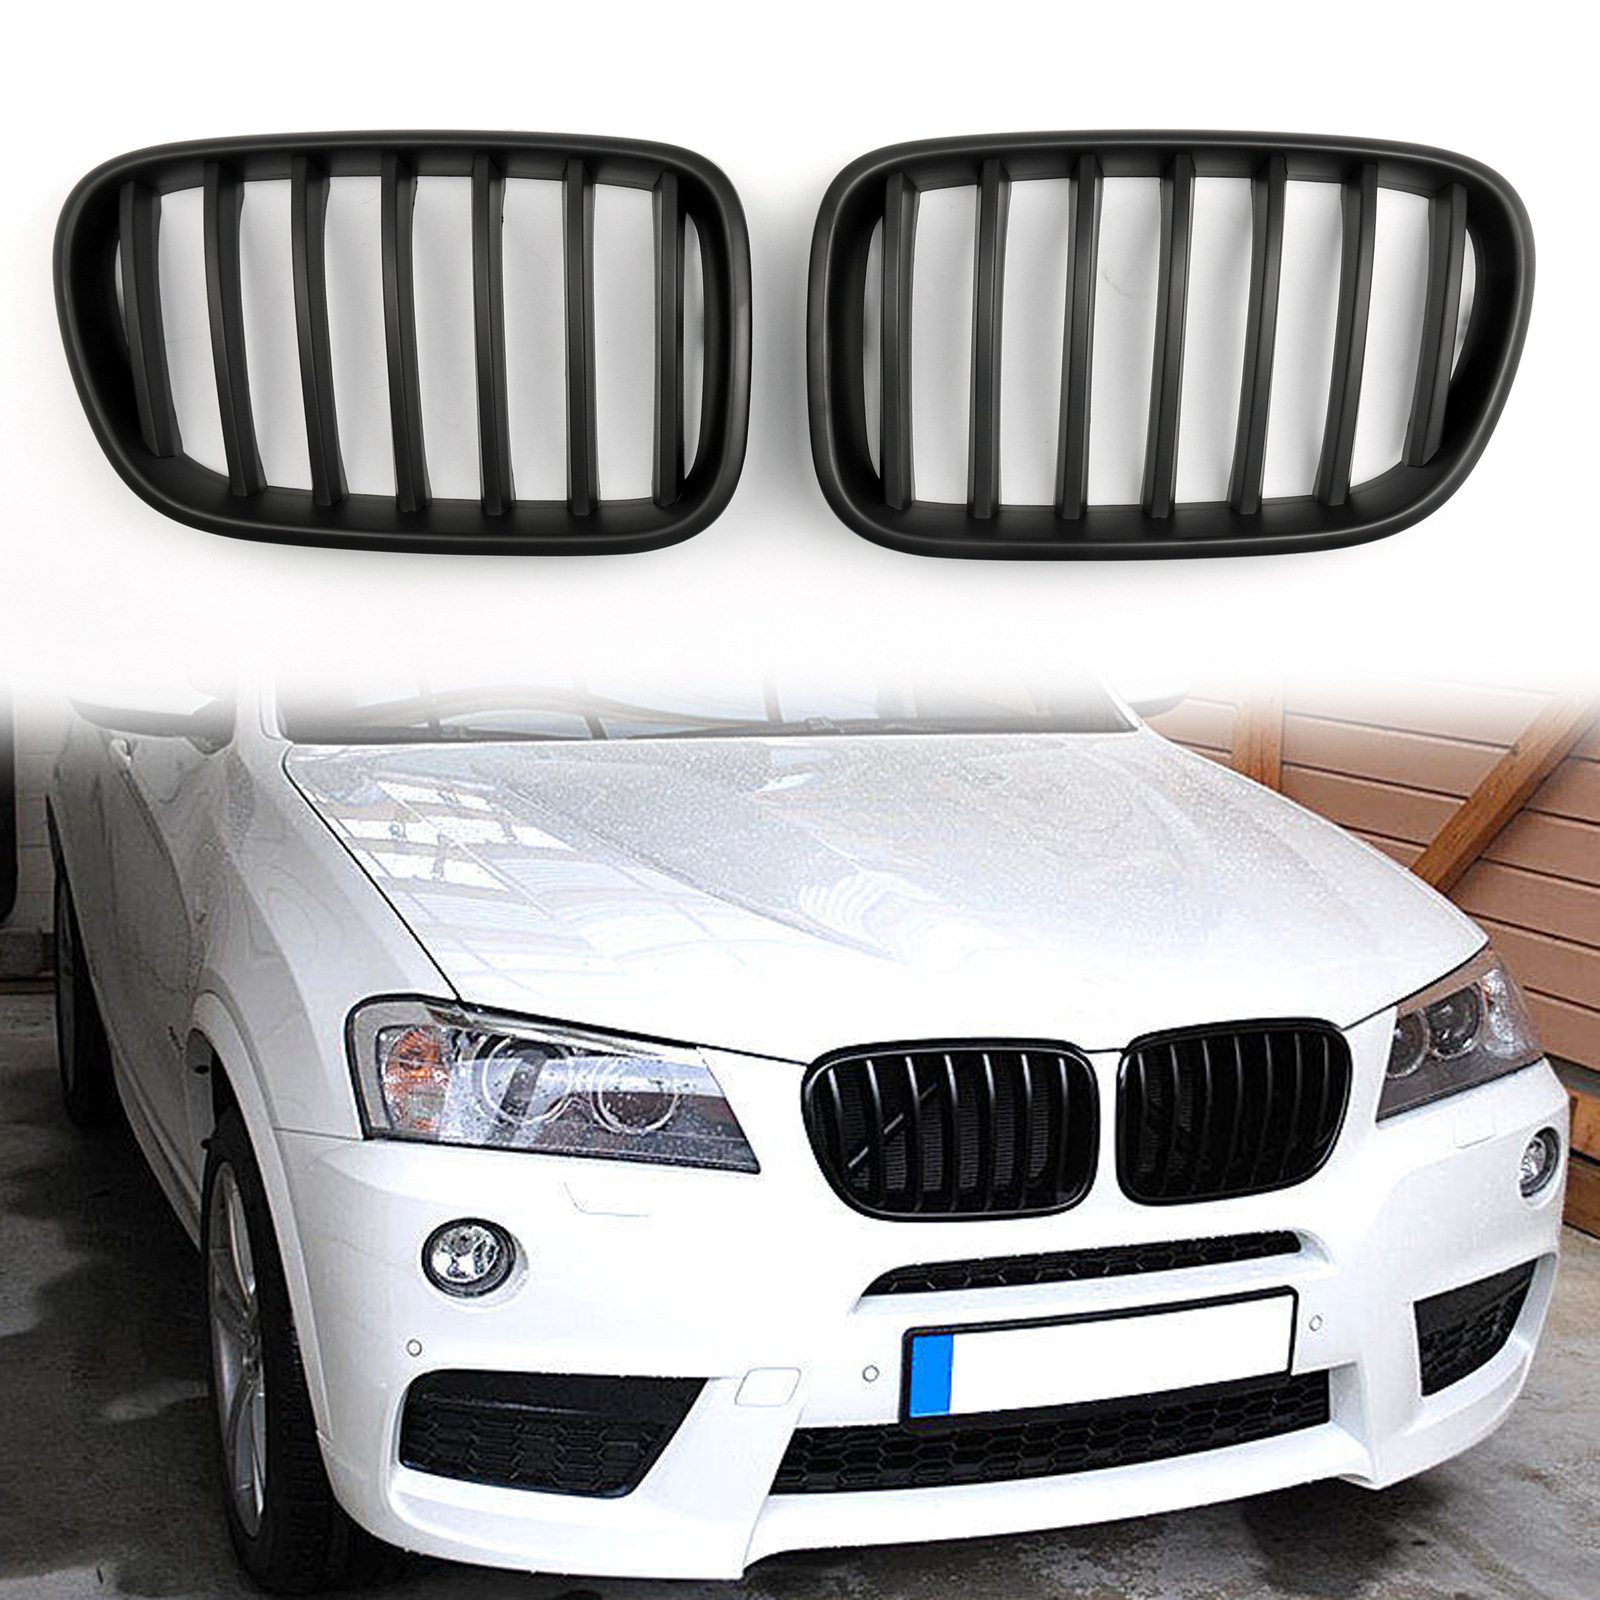 BMW X3 F25 11-17 Rear Reflector Light Lamp Set Pair M Sport Bumper Only